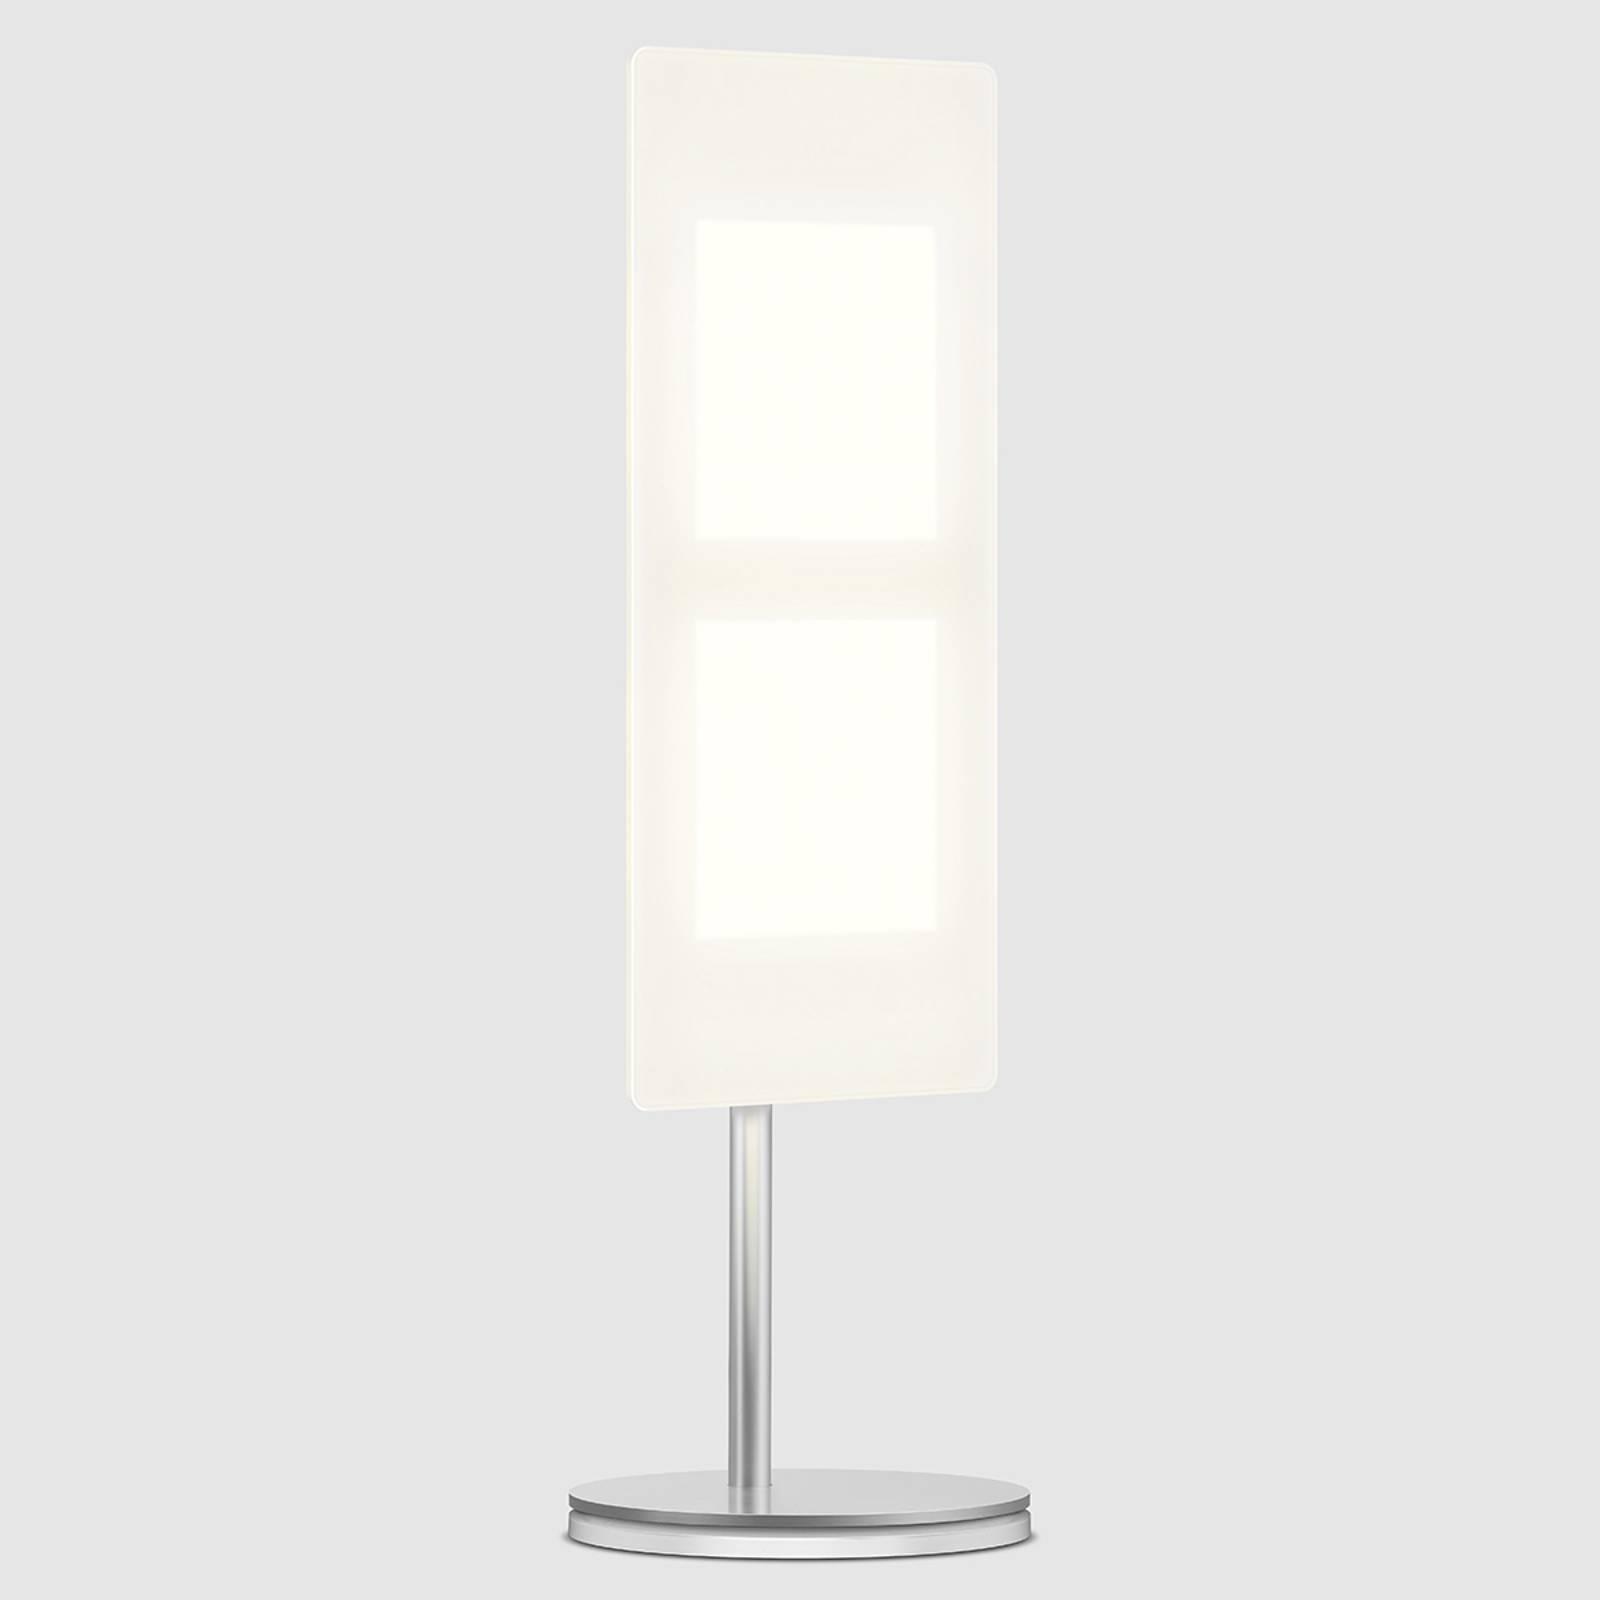 47,8 cm hoge OLED tafellamp OMLED One t2, wit